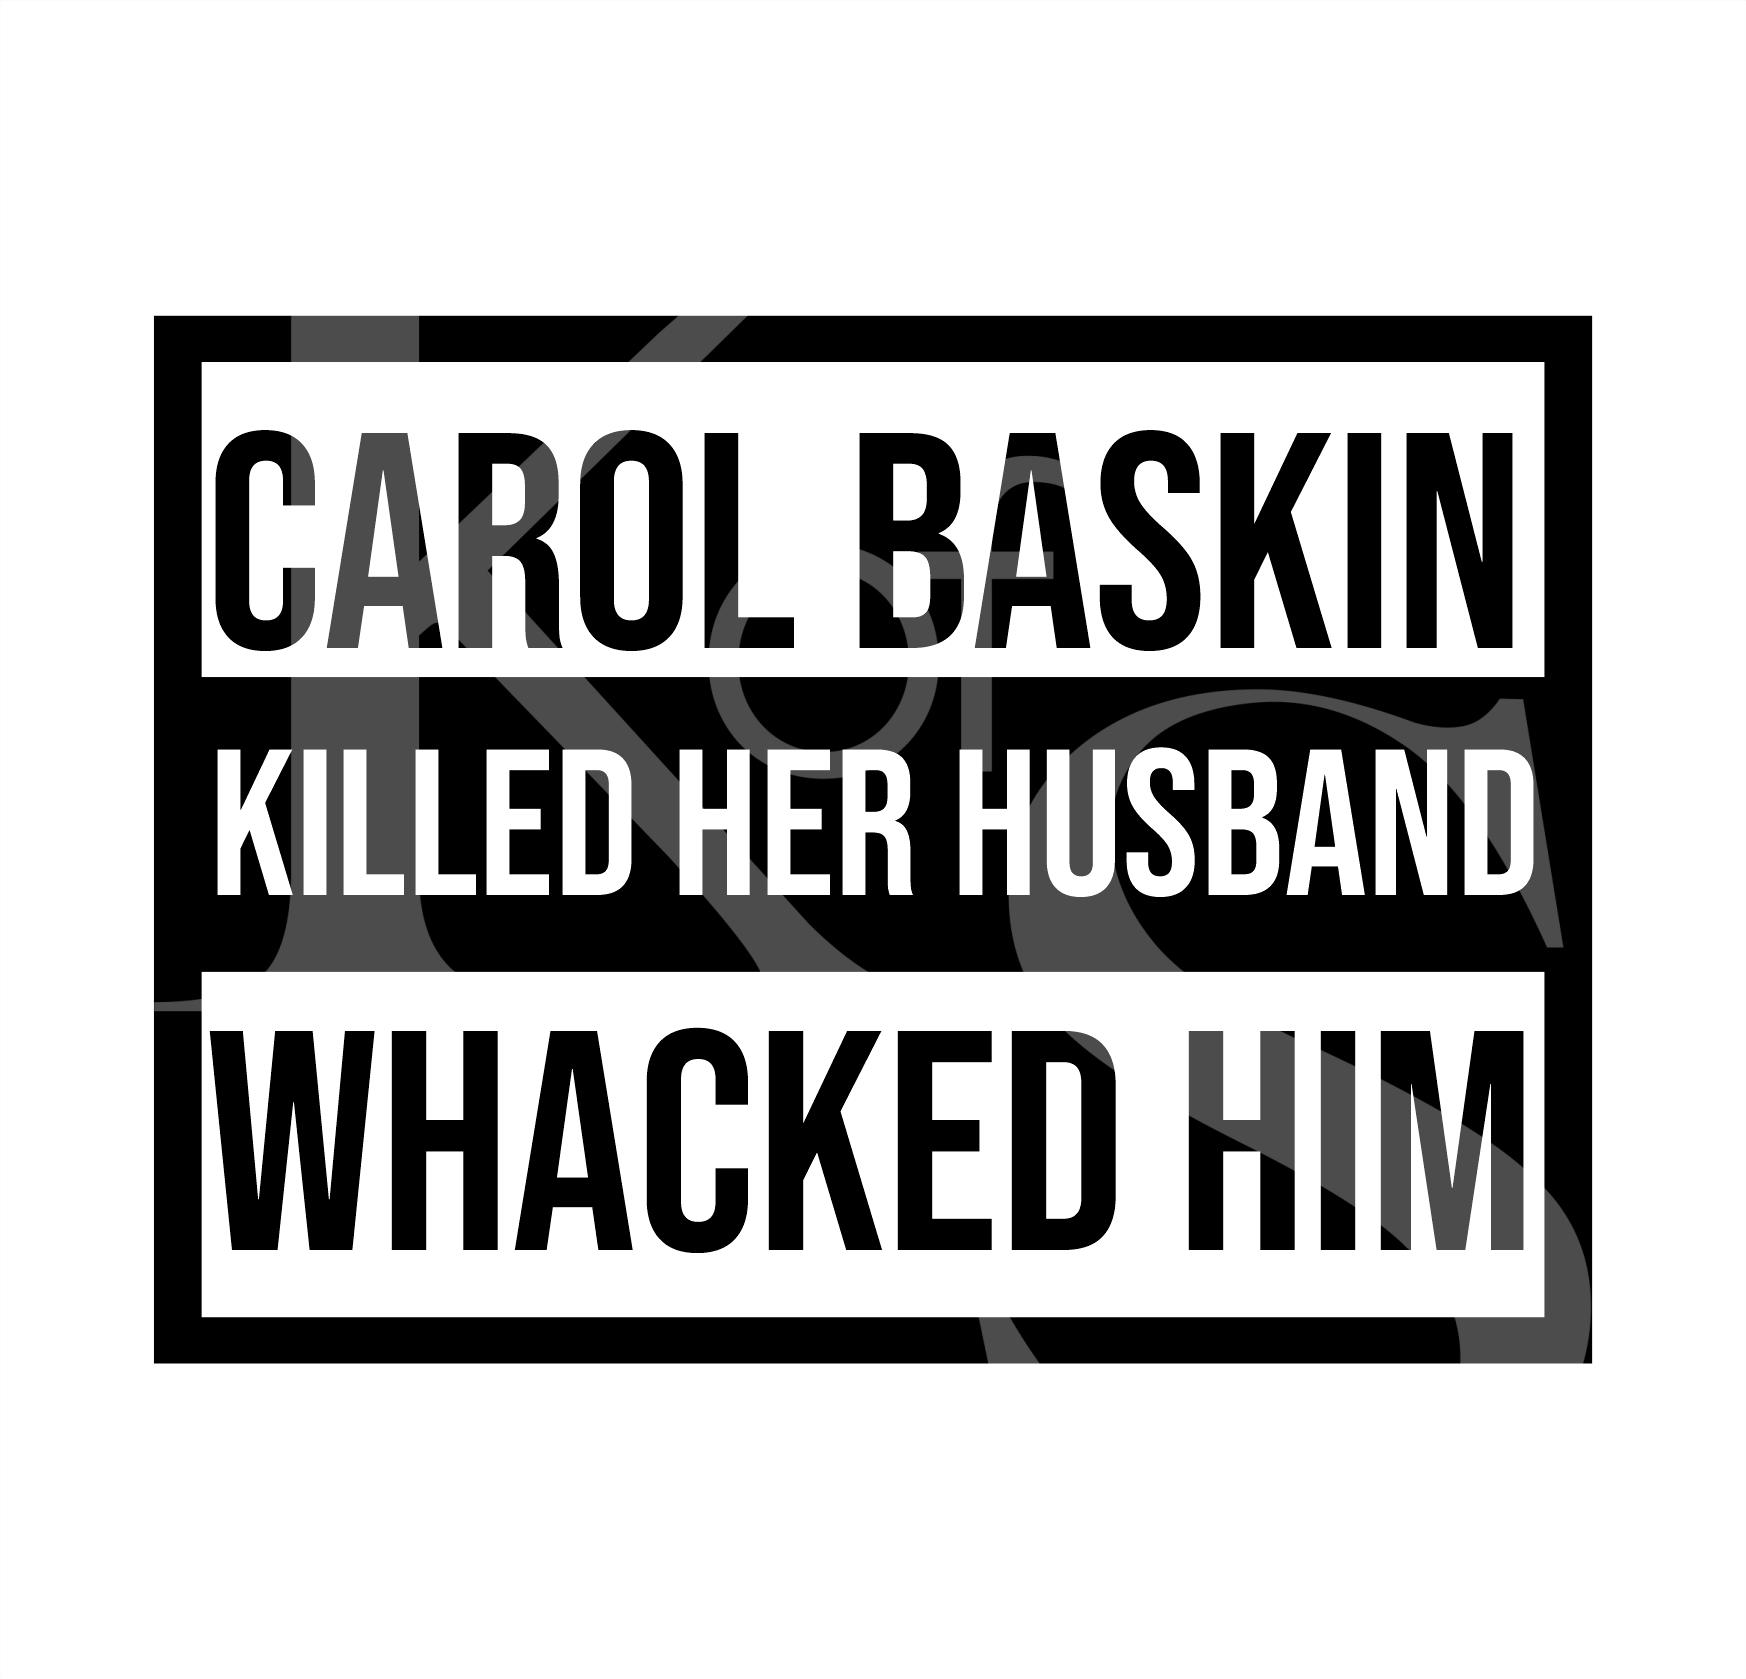 Carole Baskin Killed her Husband SVG PNG Shirt Silhouette Cricket Craft